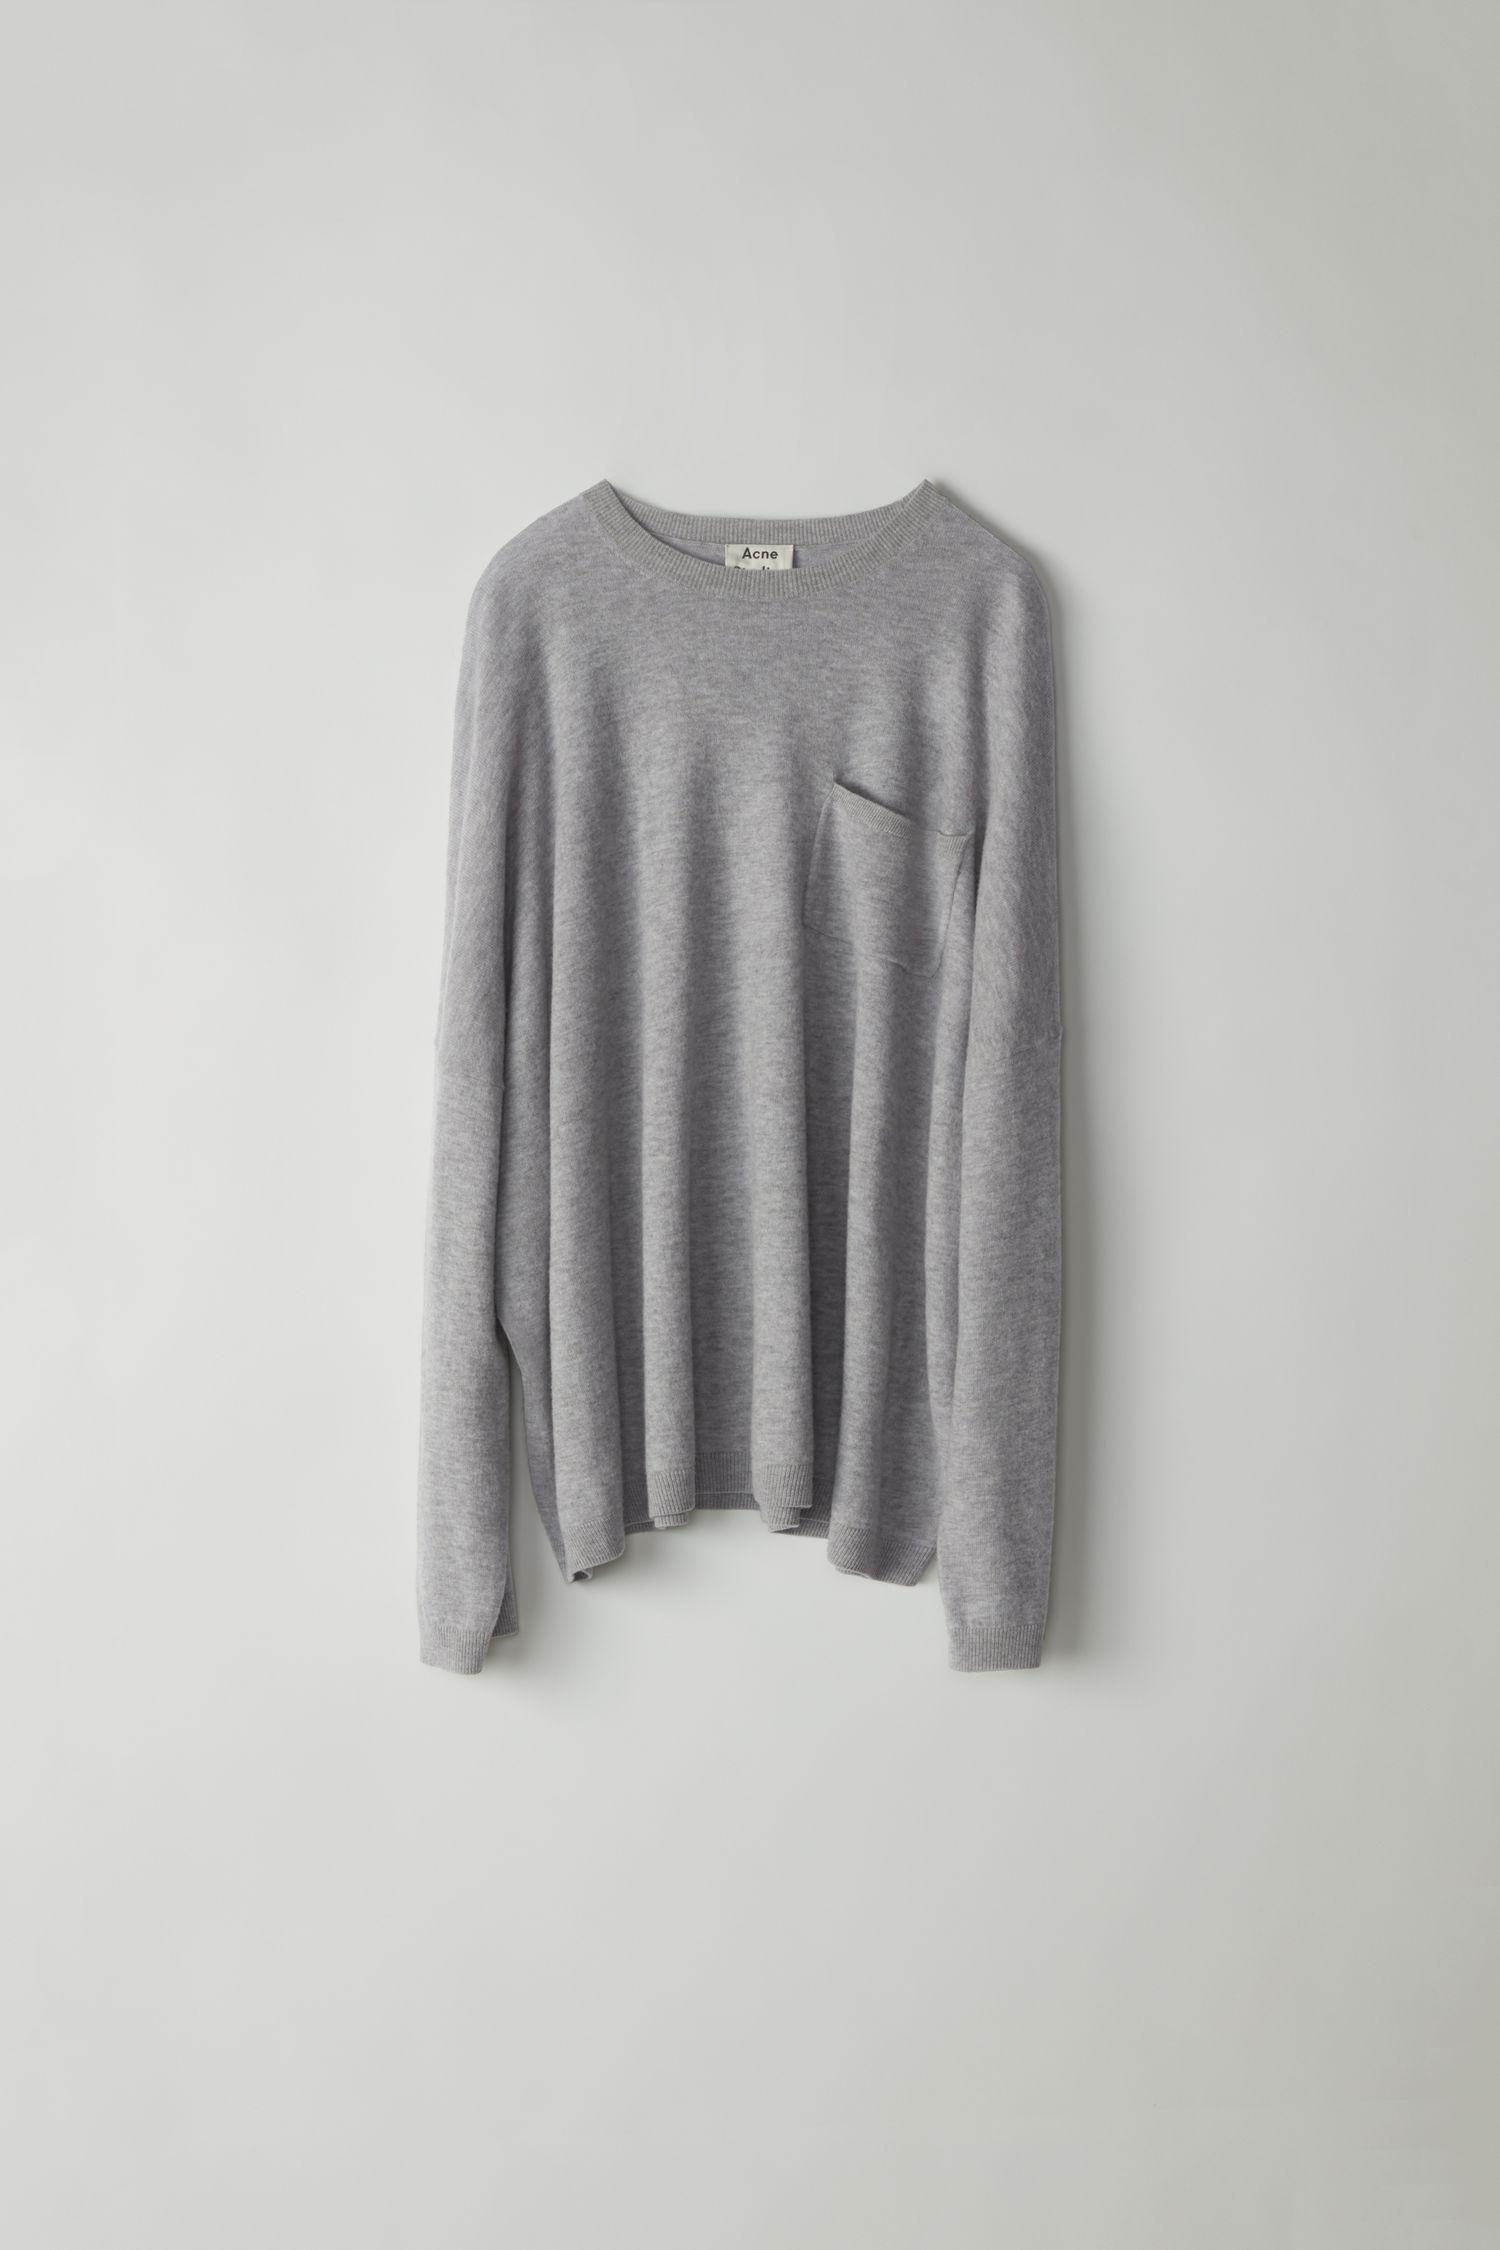 acne sweater.jpg